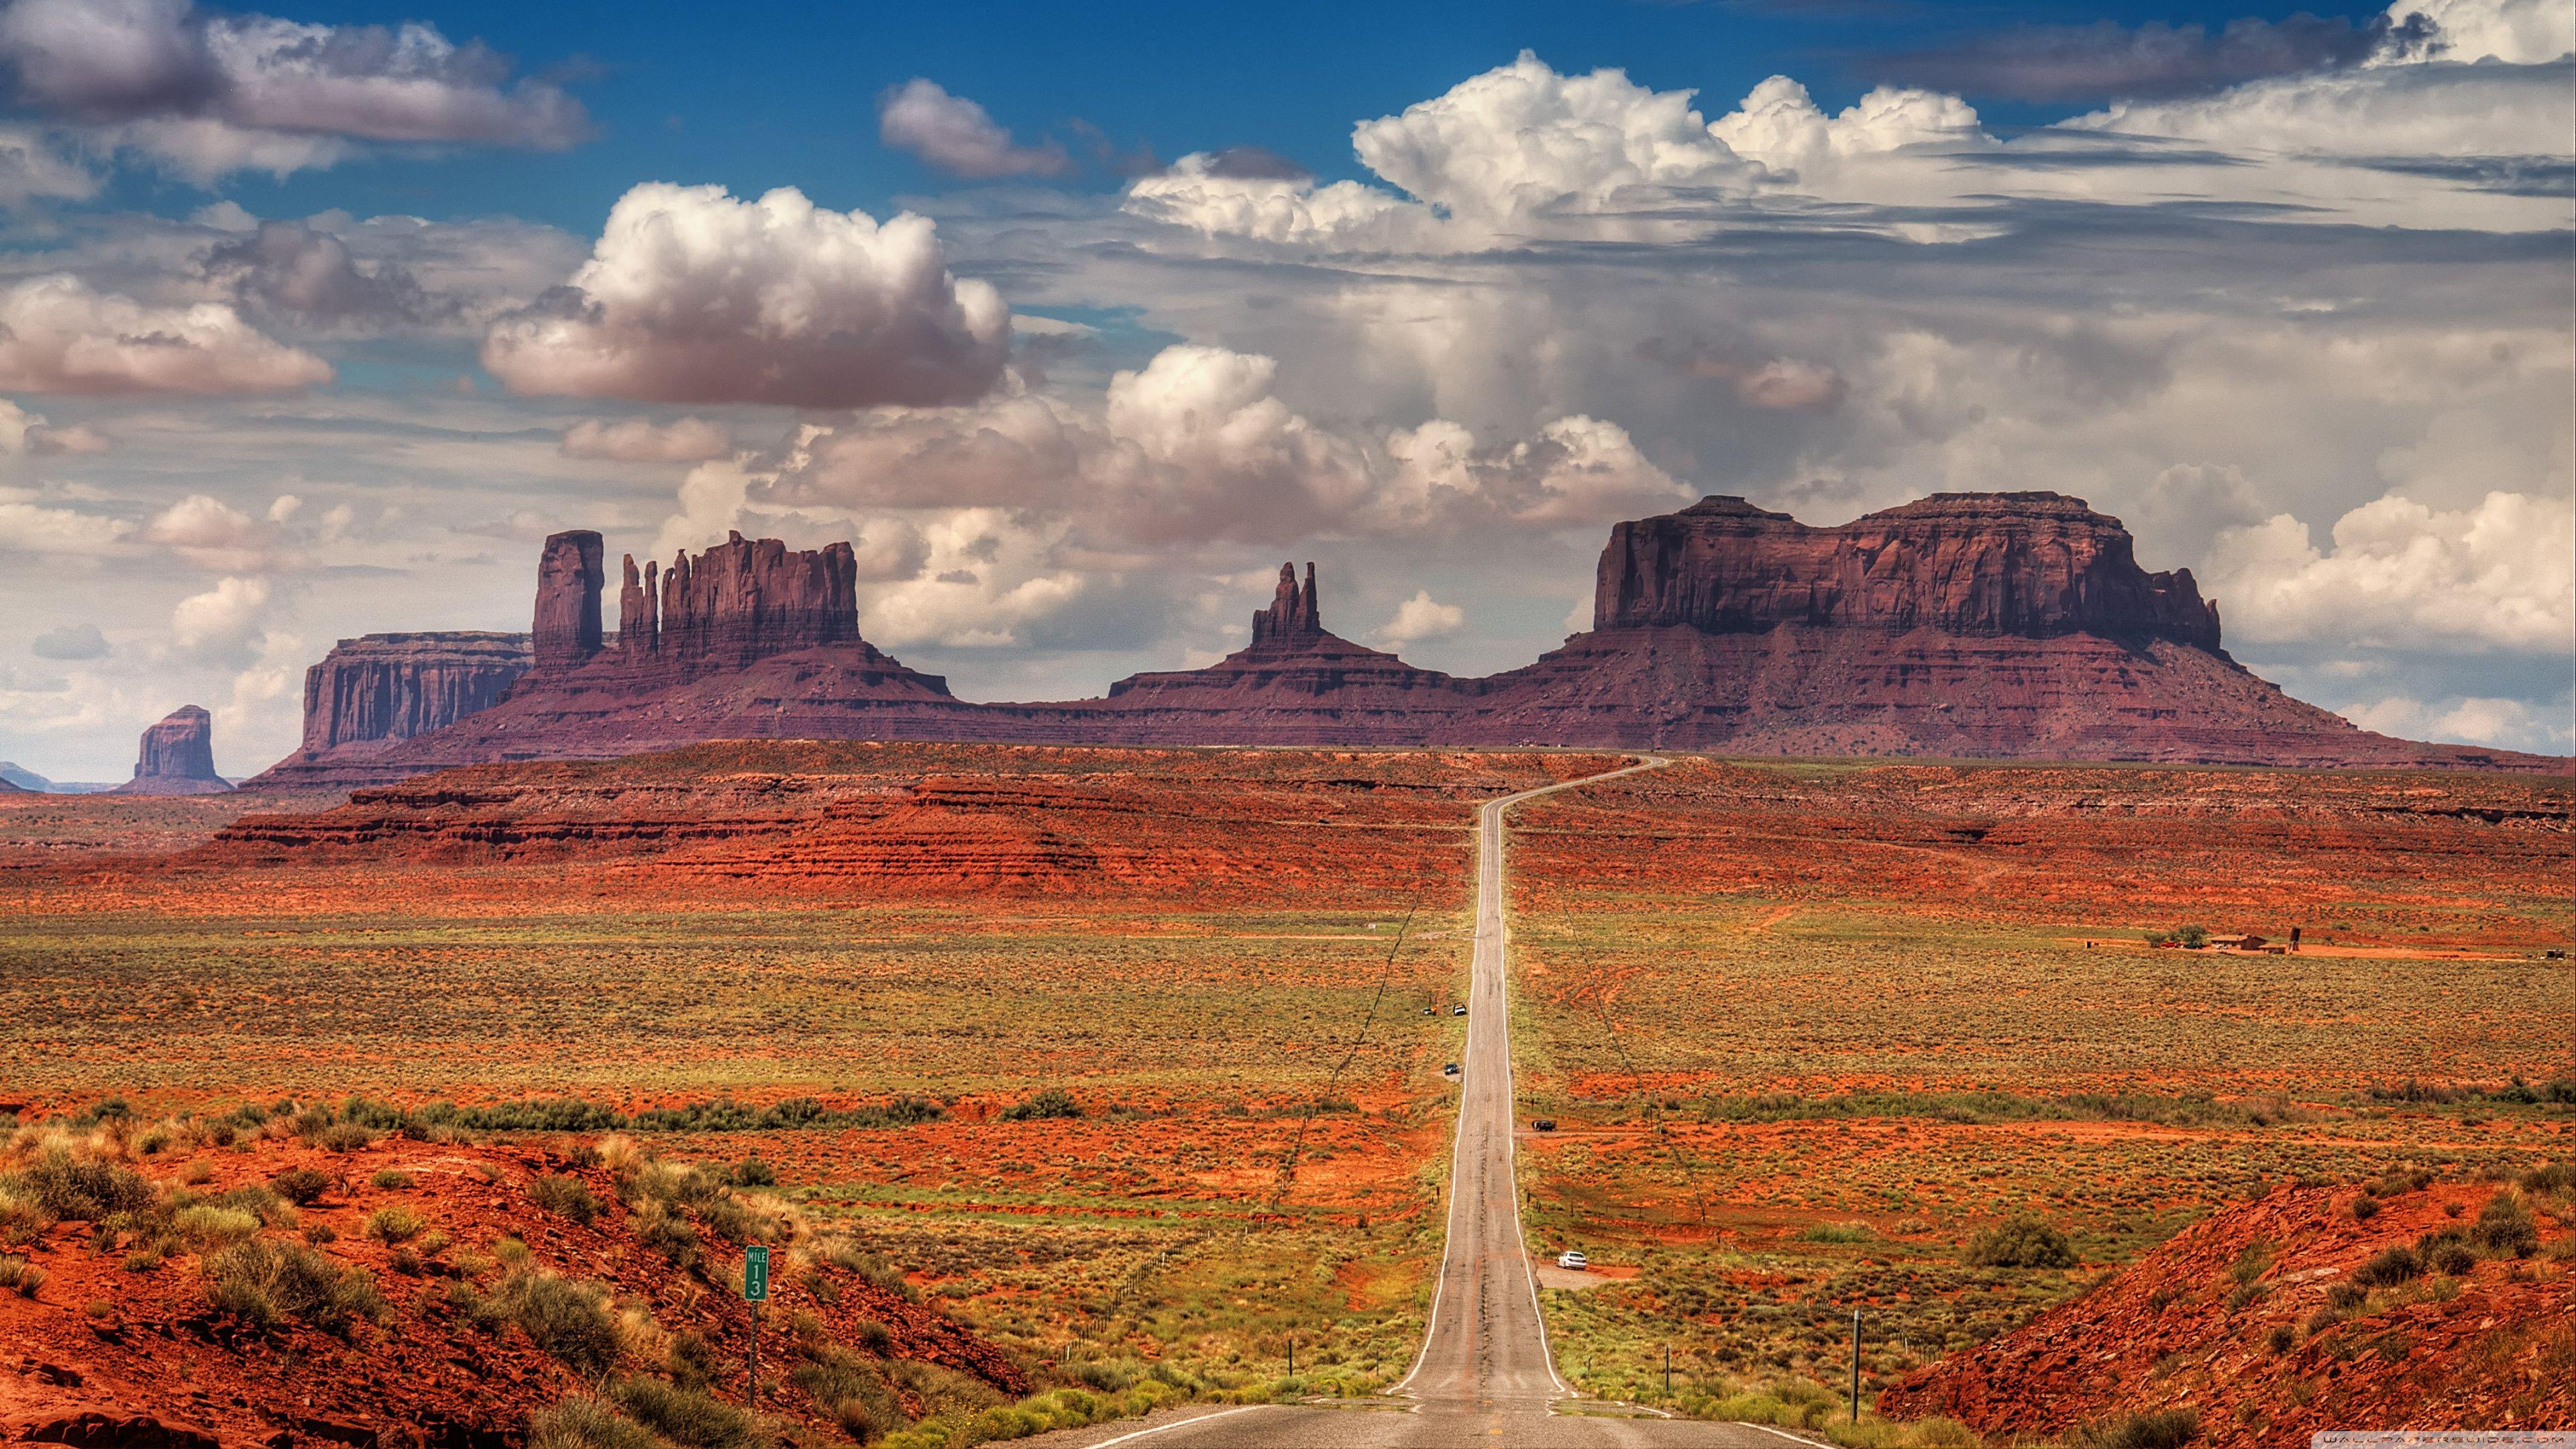 desert landscape wallpapers top